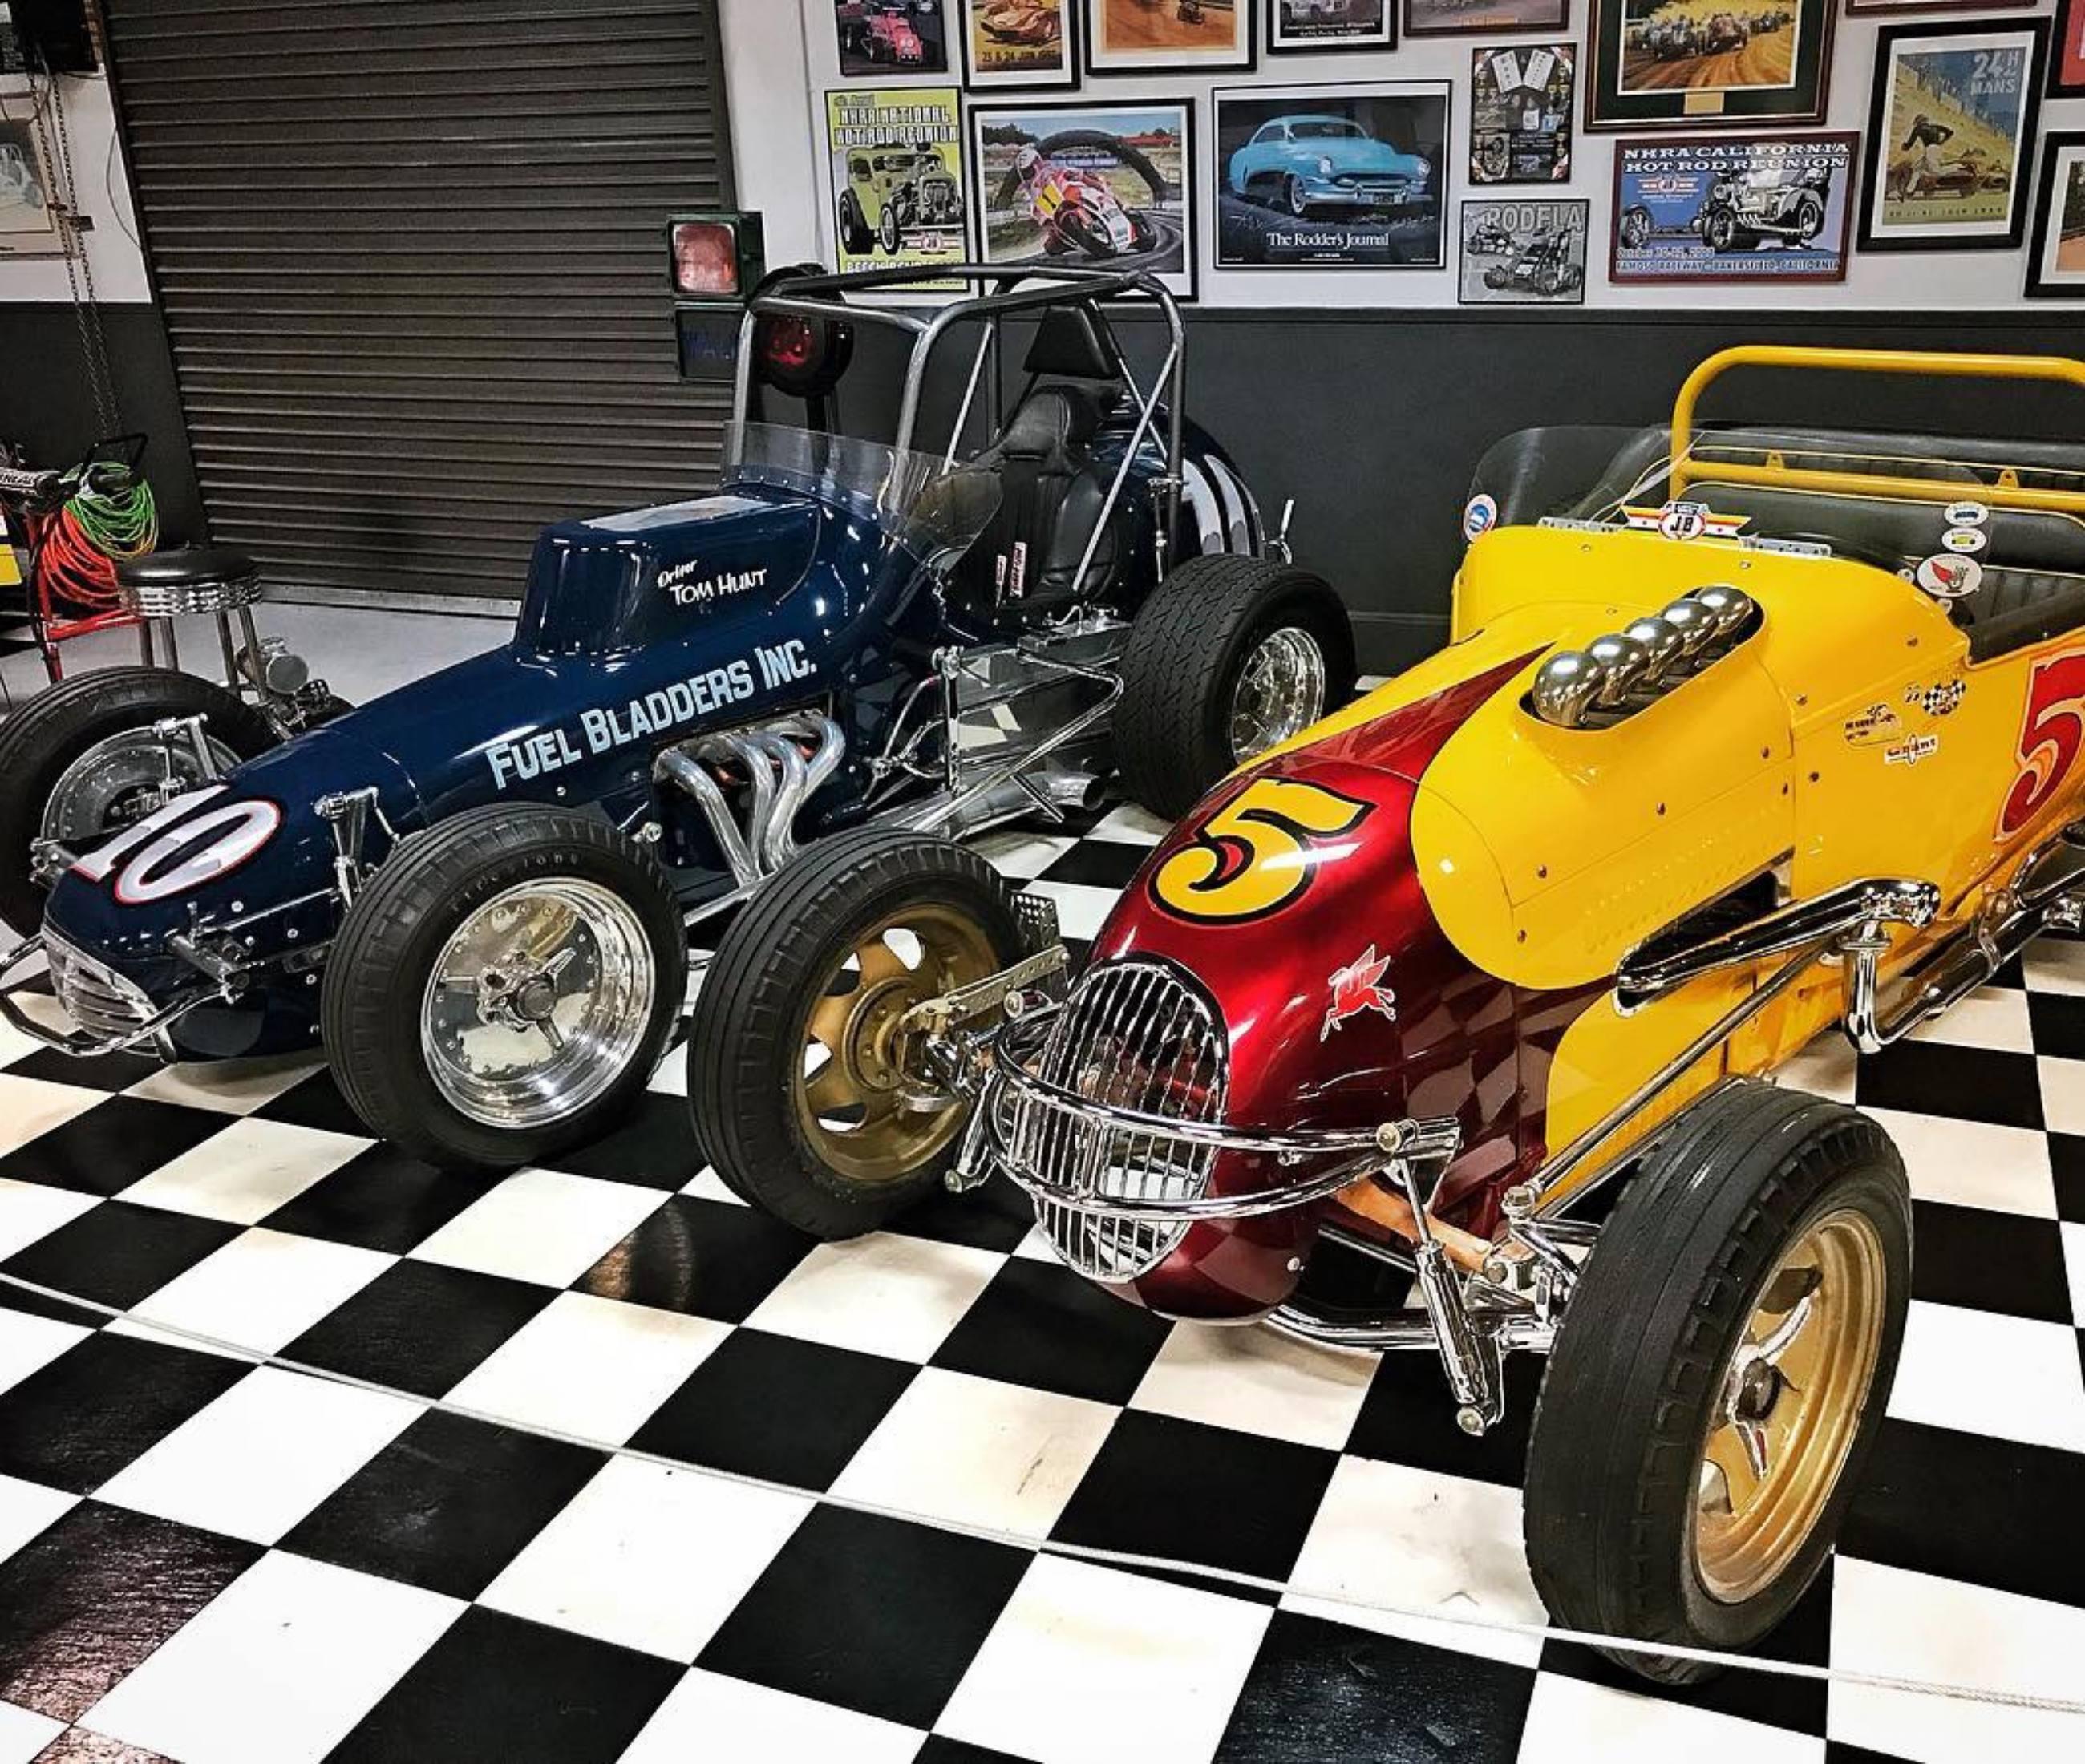 Justice Private Automotive Collection in Duarte